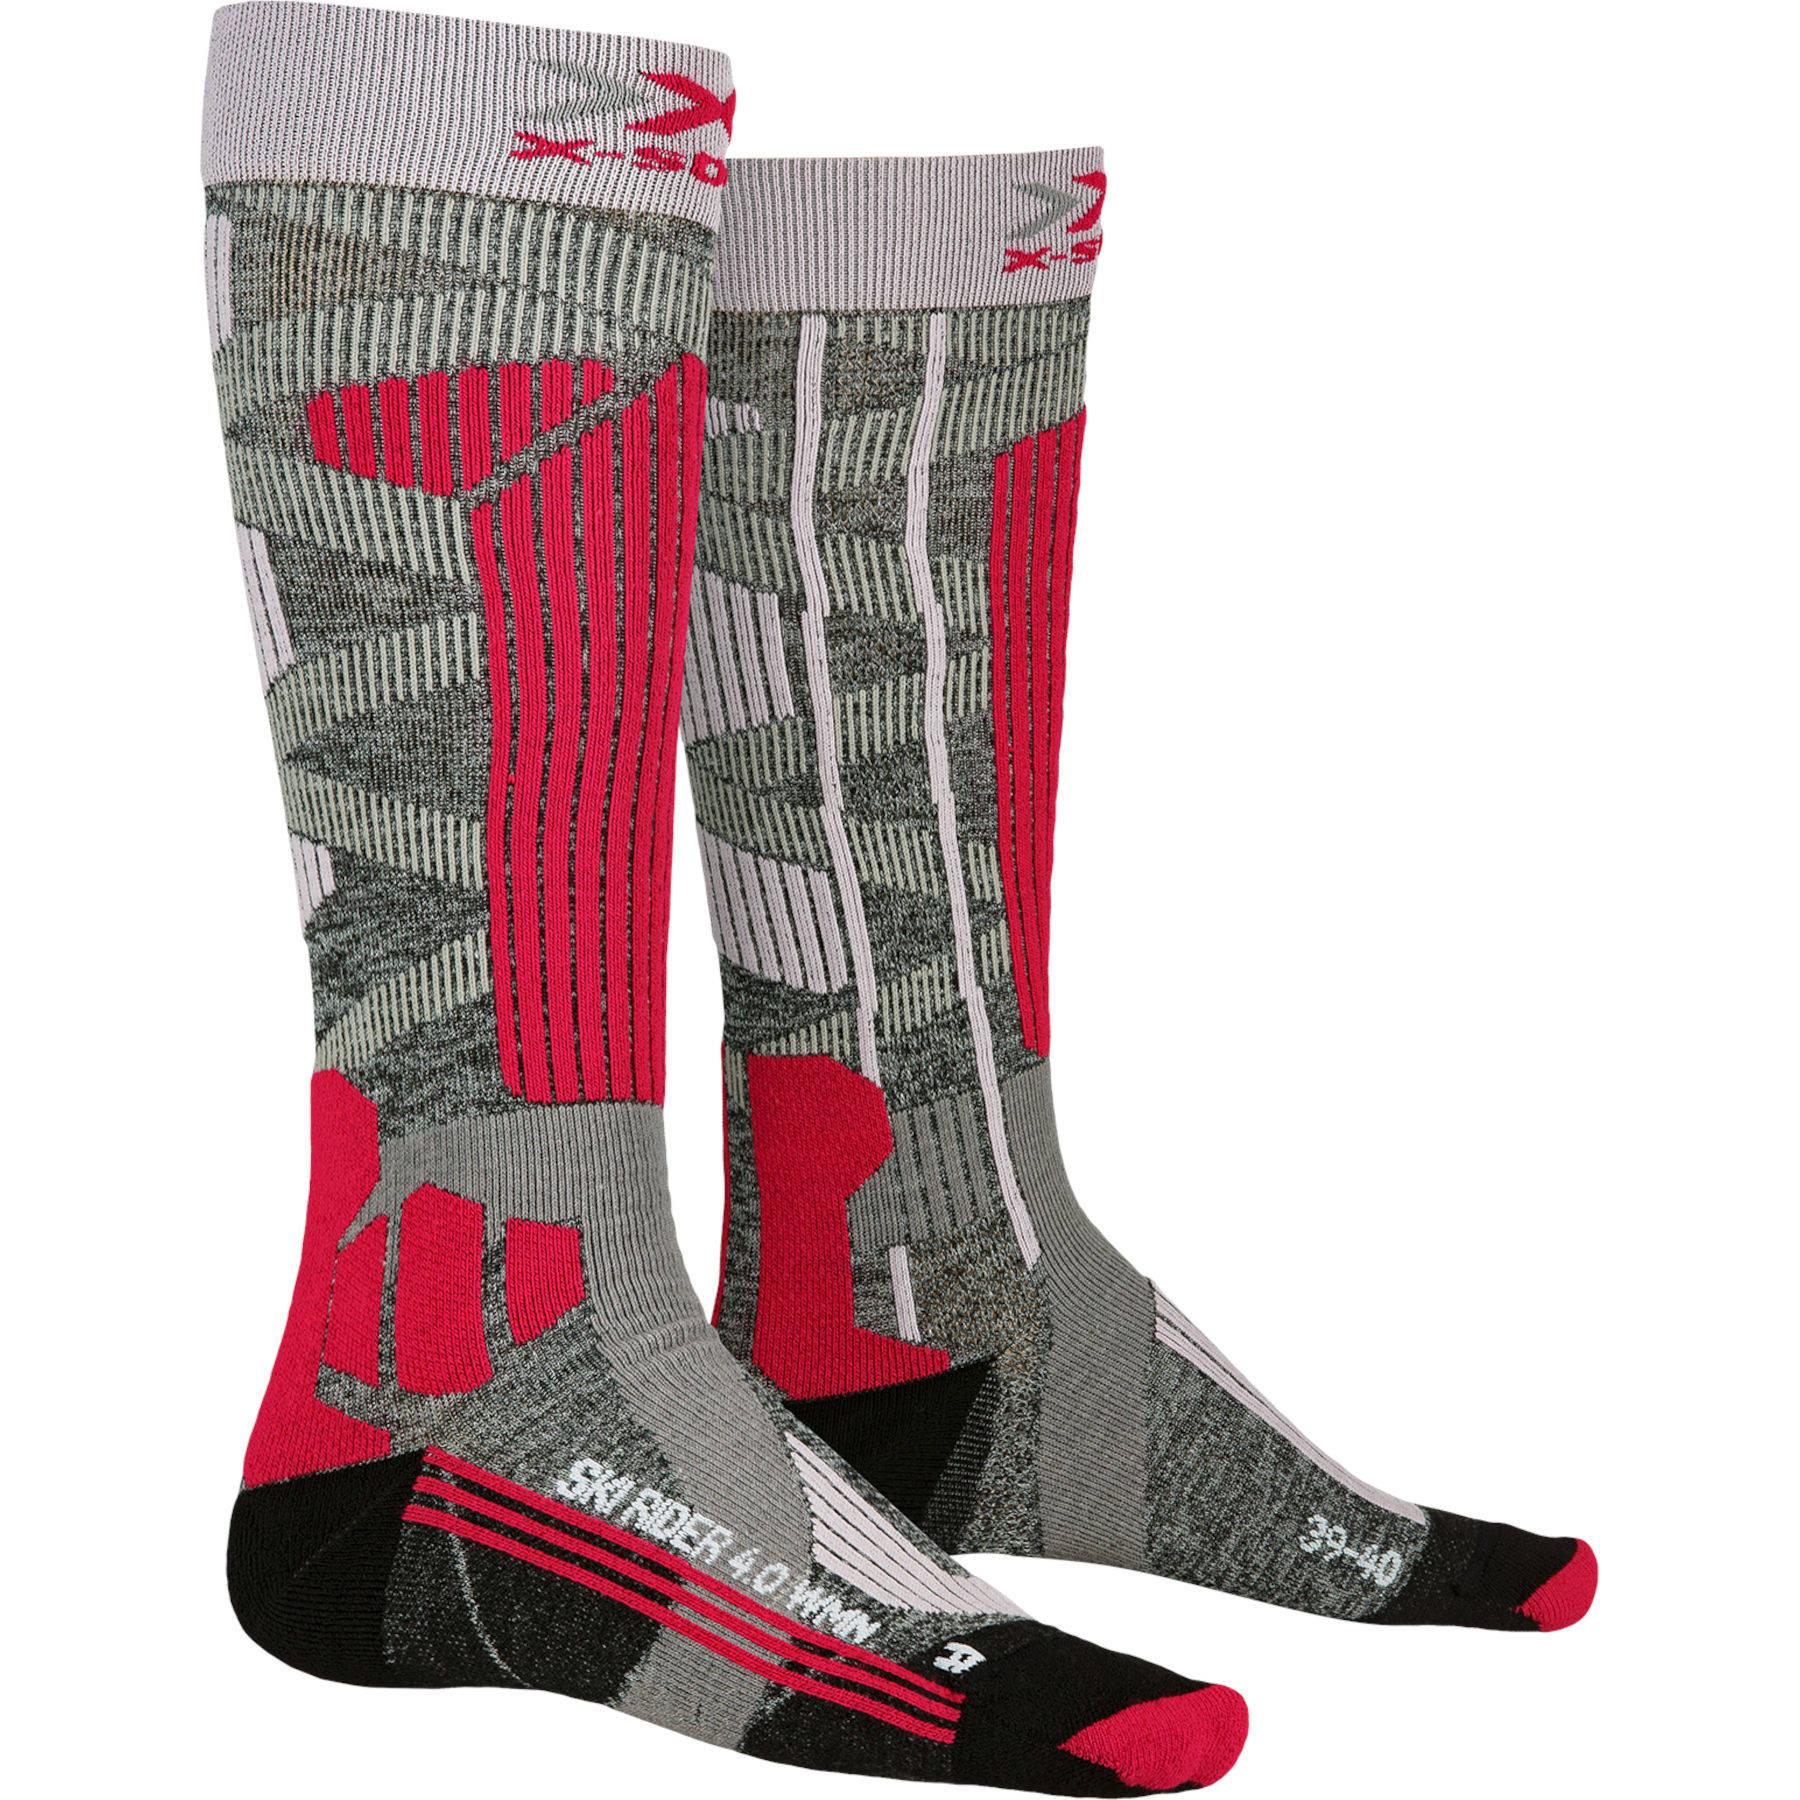 Image of X-Socks Ski Rider 4.0 Socks for Women - stone grey melange/pink